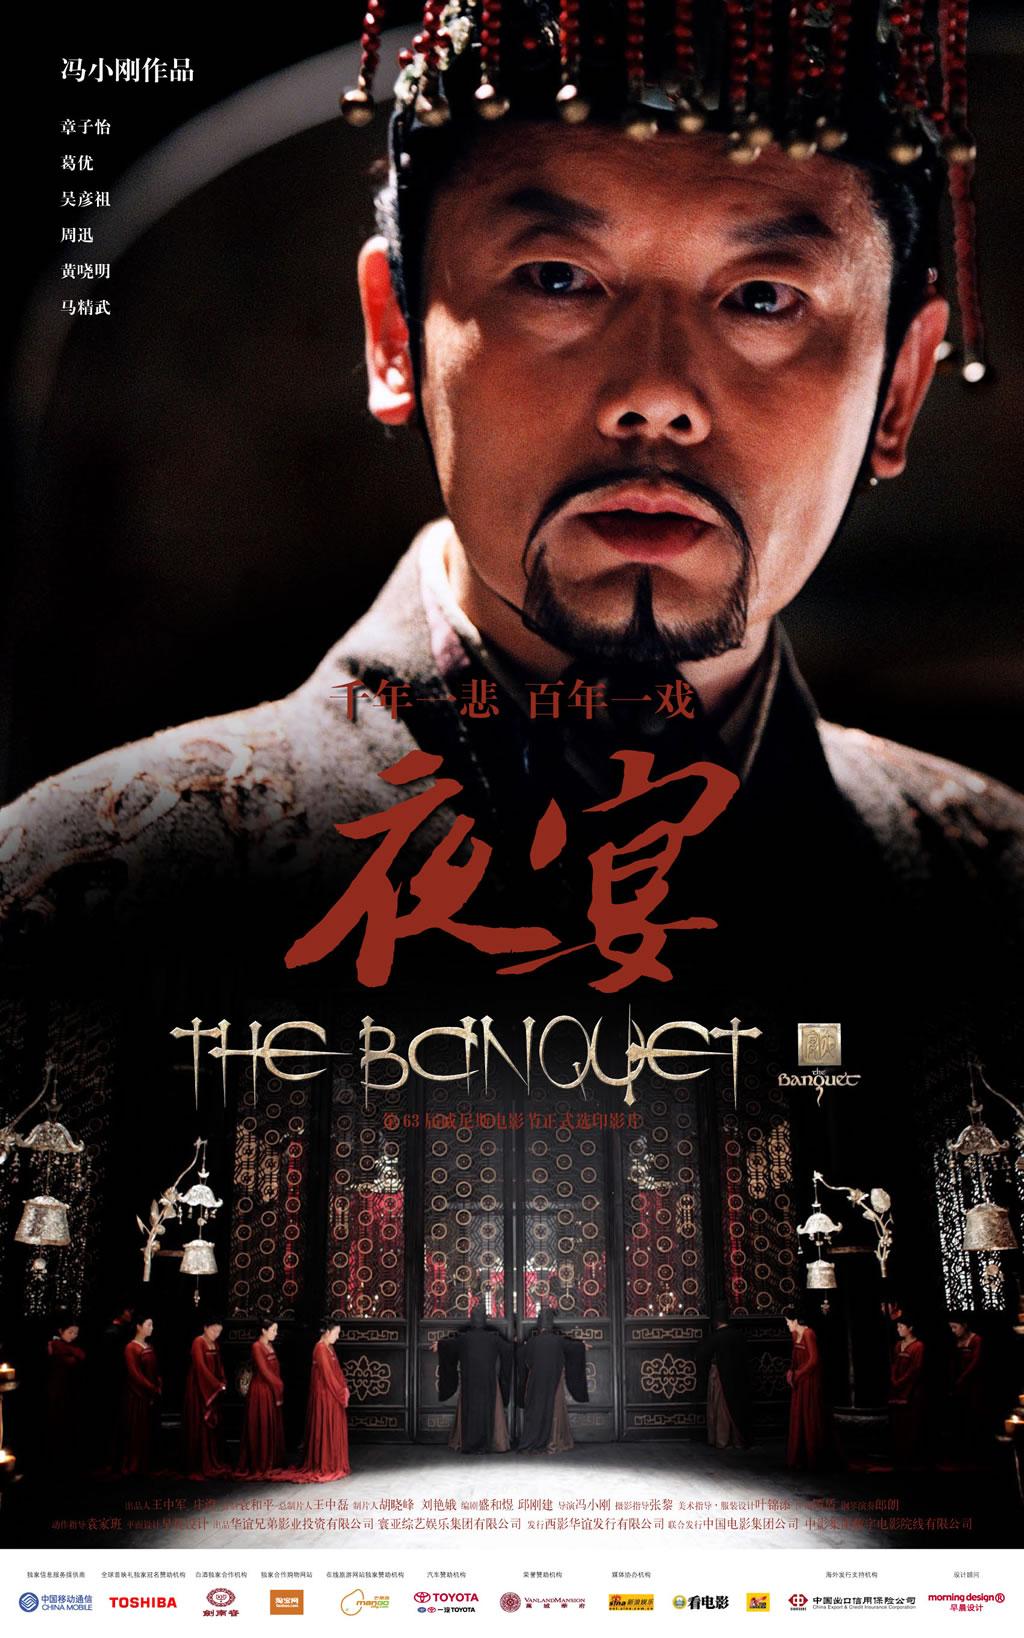 banquet-12.jpg